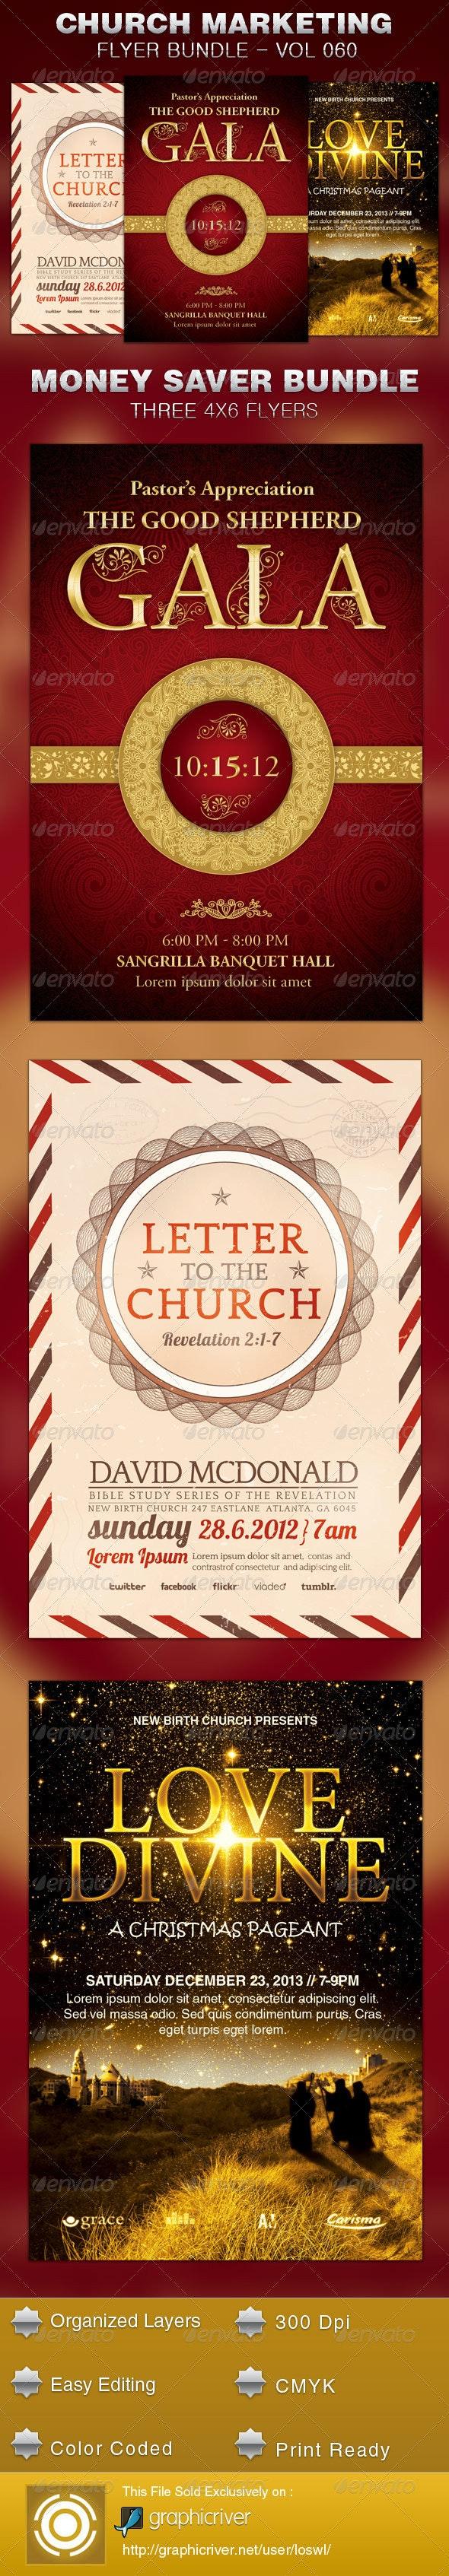 Church Marketing Flyer Template Bundle Vol 060 - Church Flyers